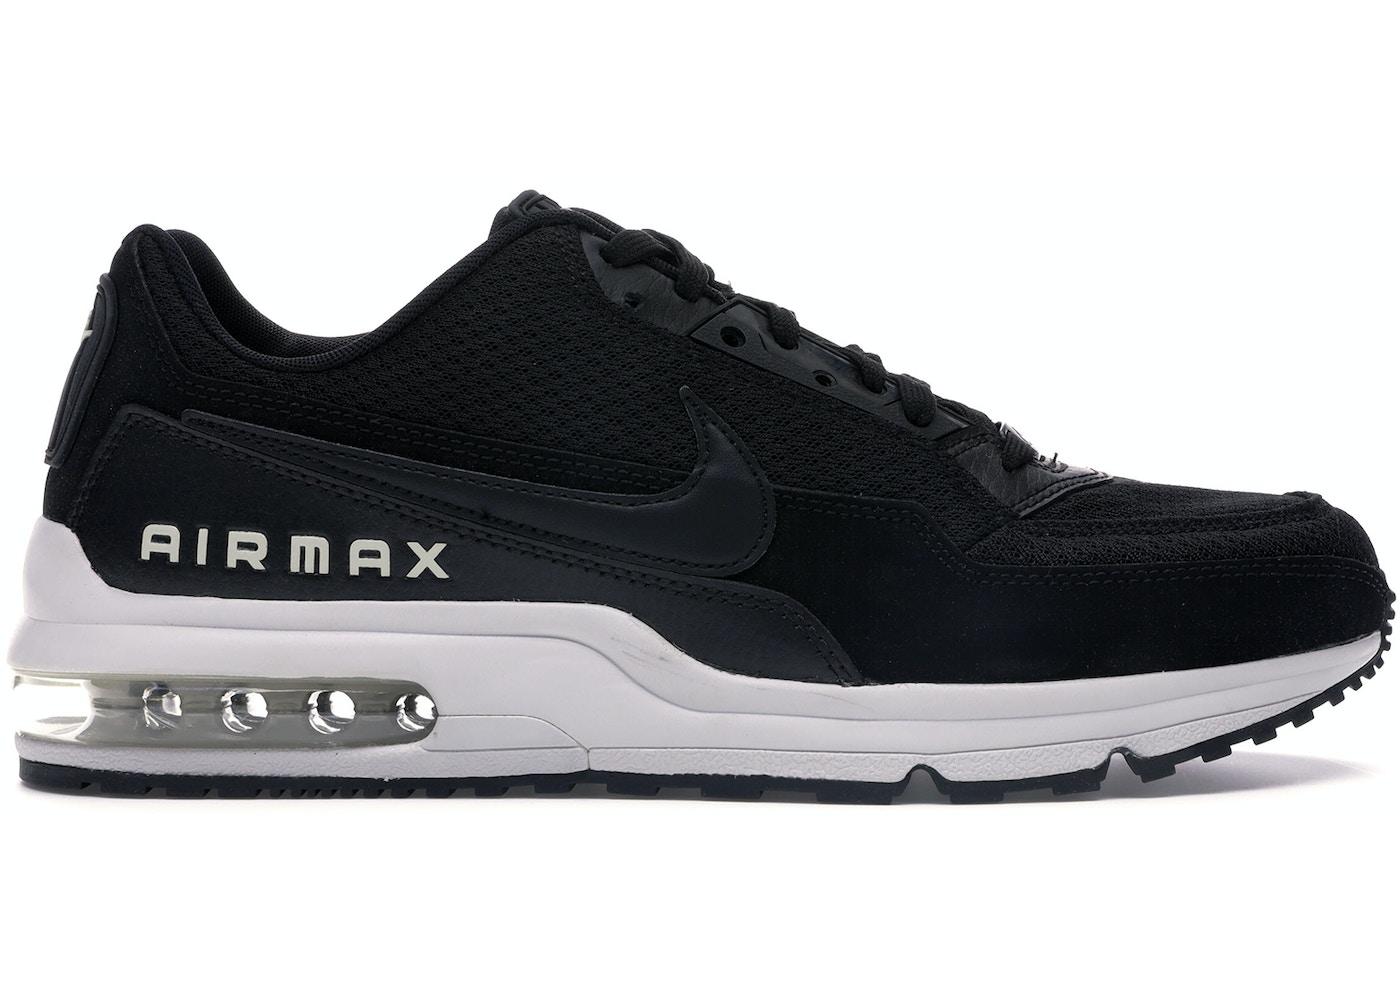 acheter en ligne ffce2 eec5b Nike Air Max Ltd 3 Prem Black/Black-Pale Grey